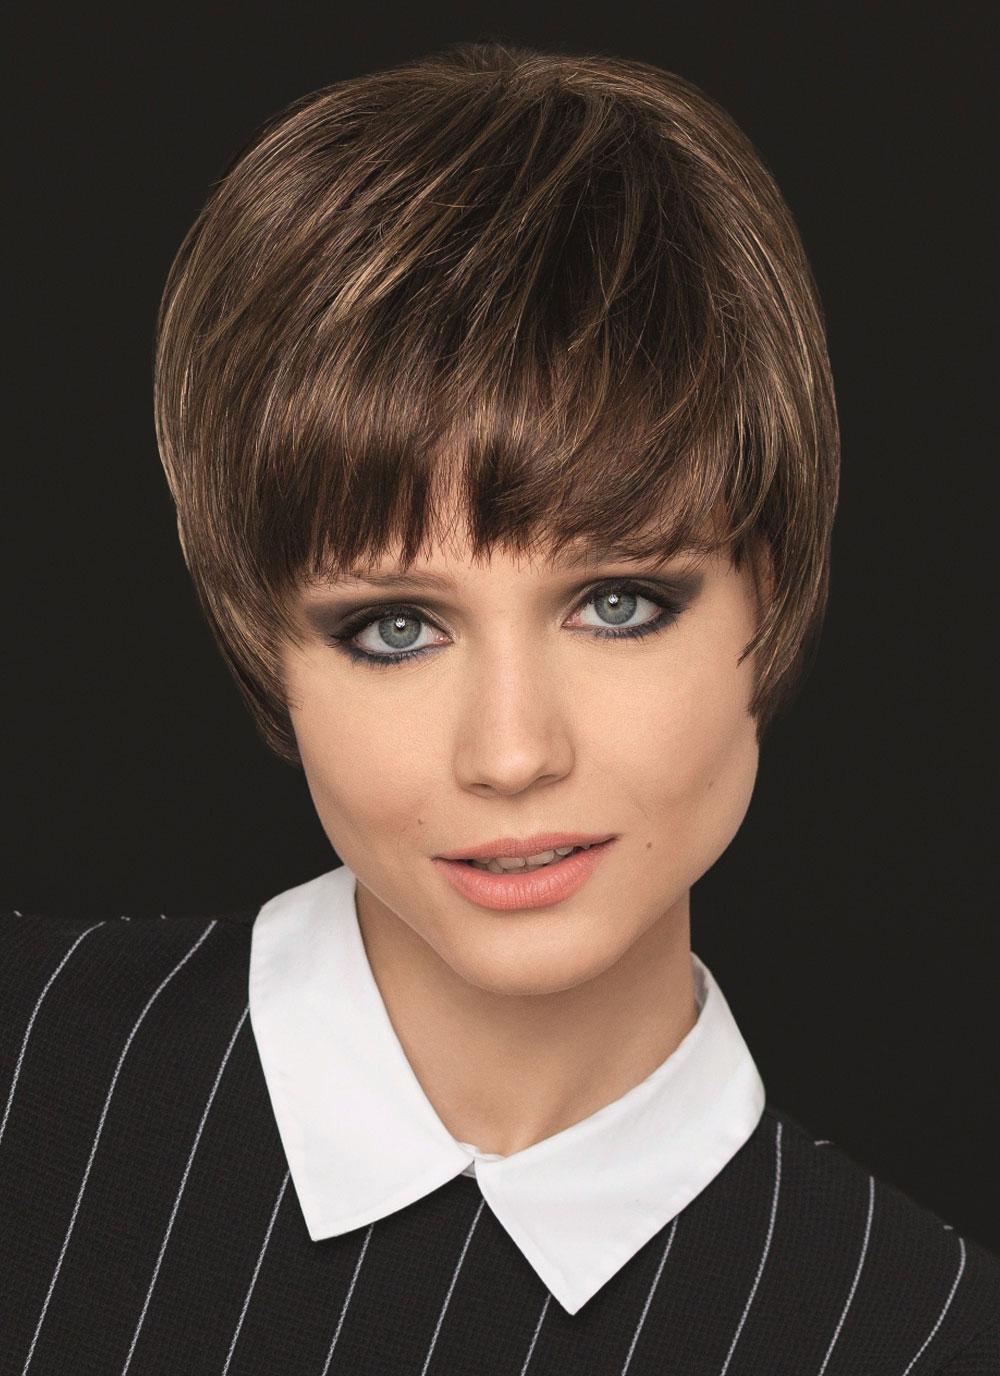 Gisela Mayer Perücke - Visconti Fashion Cut